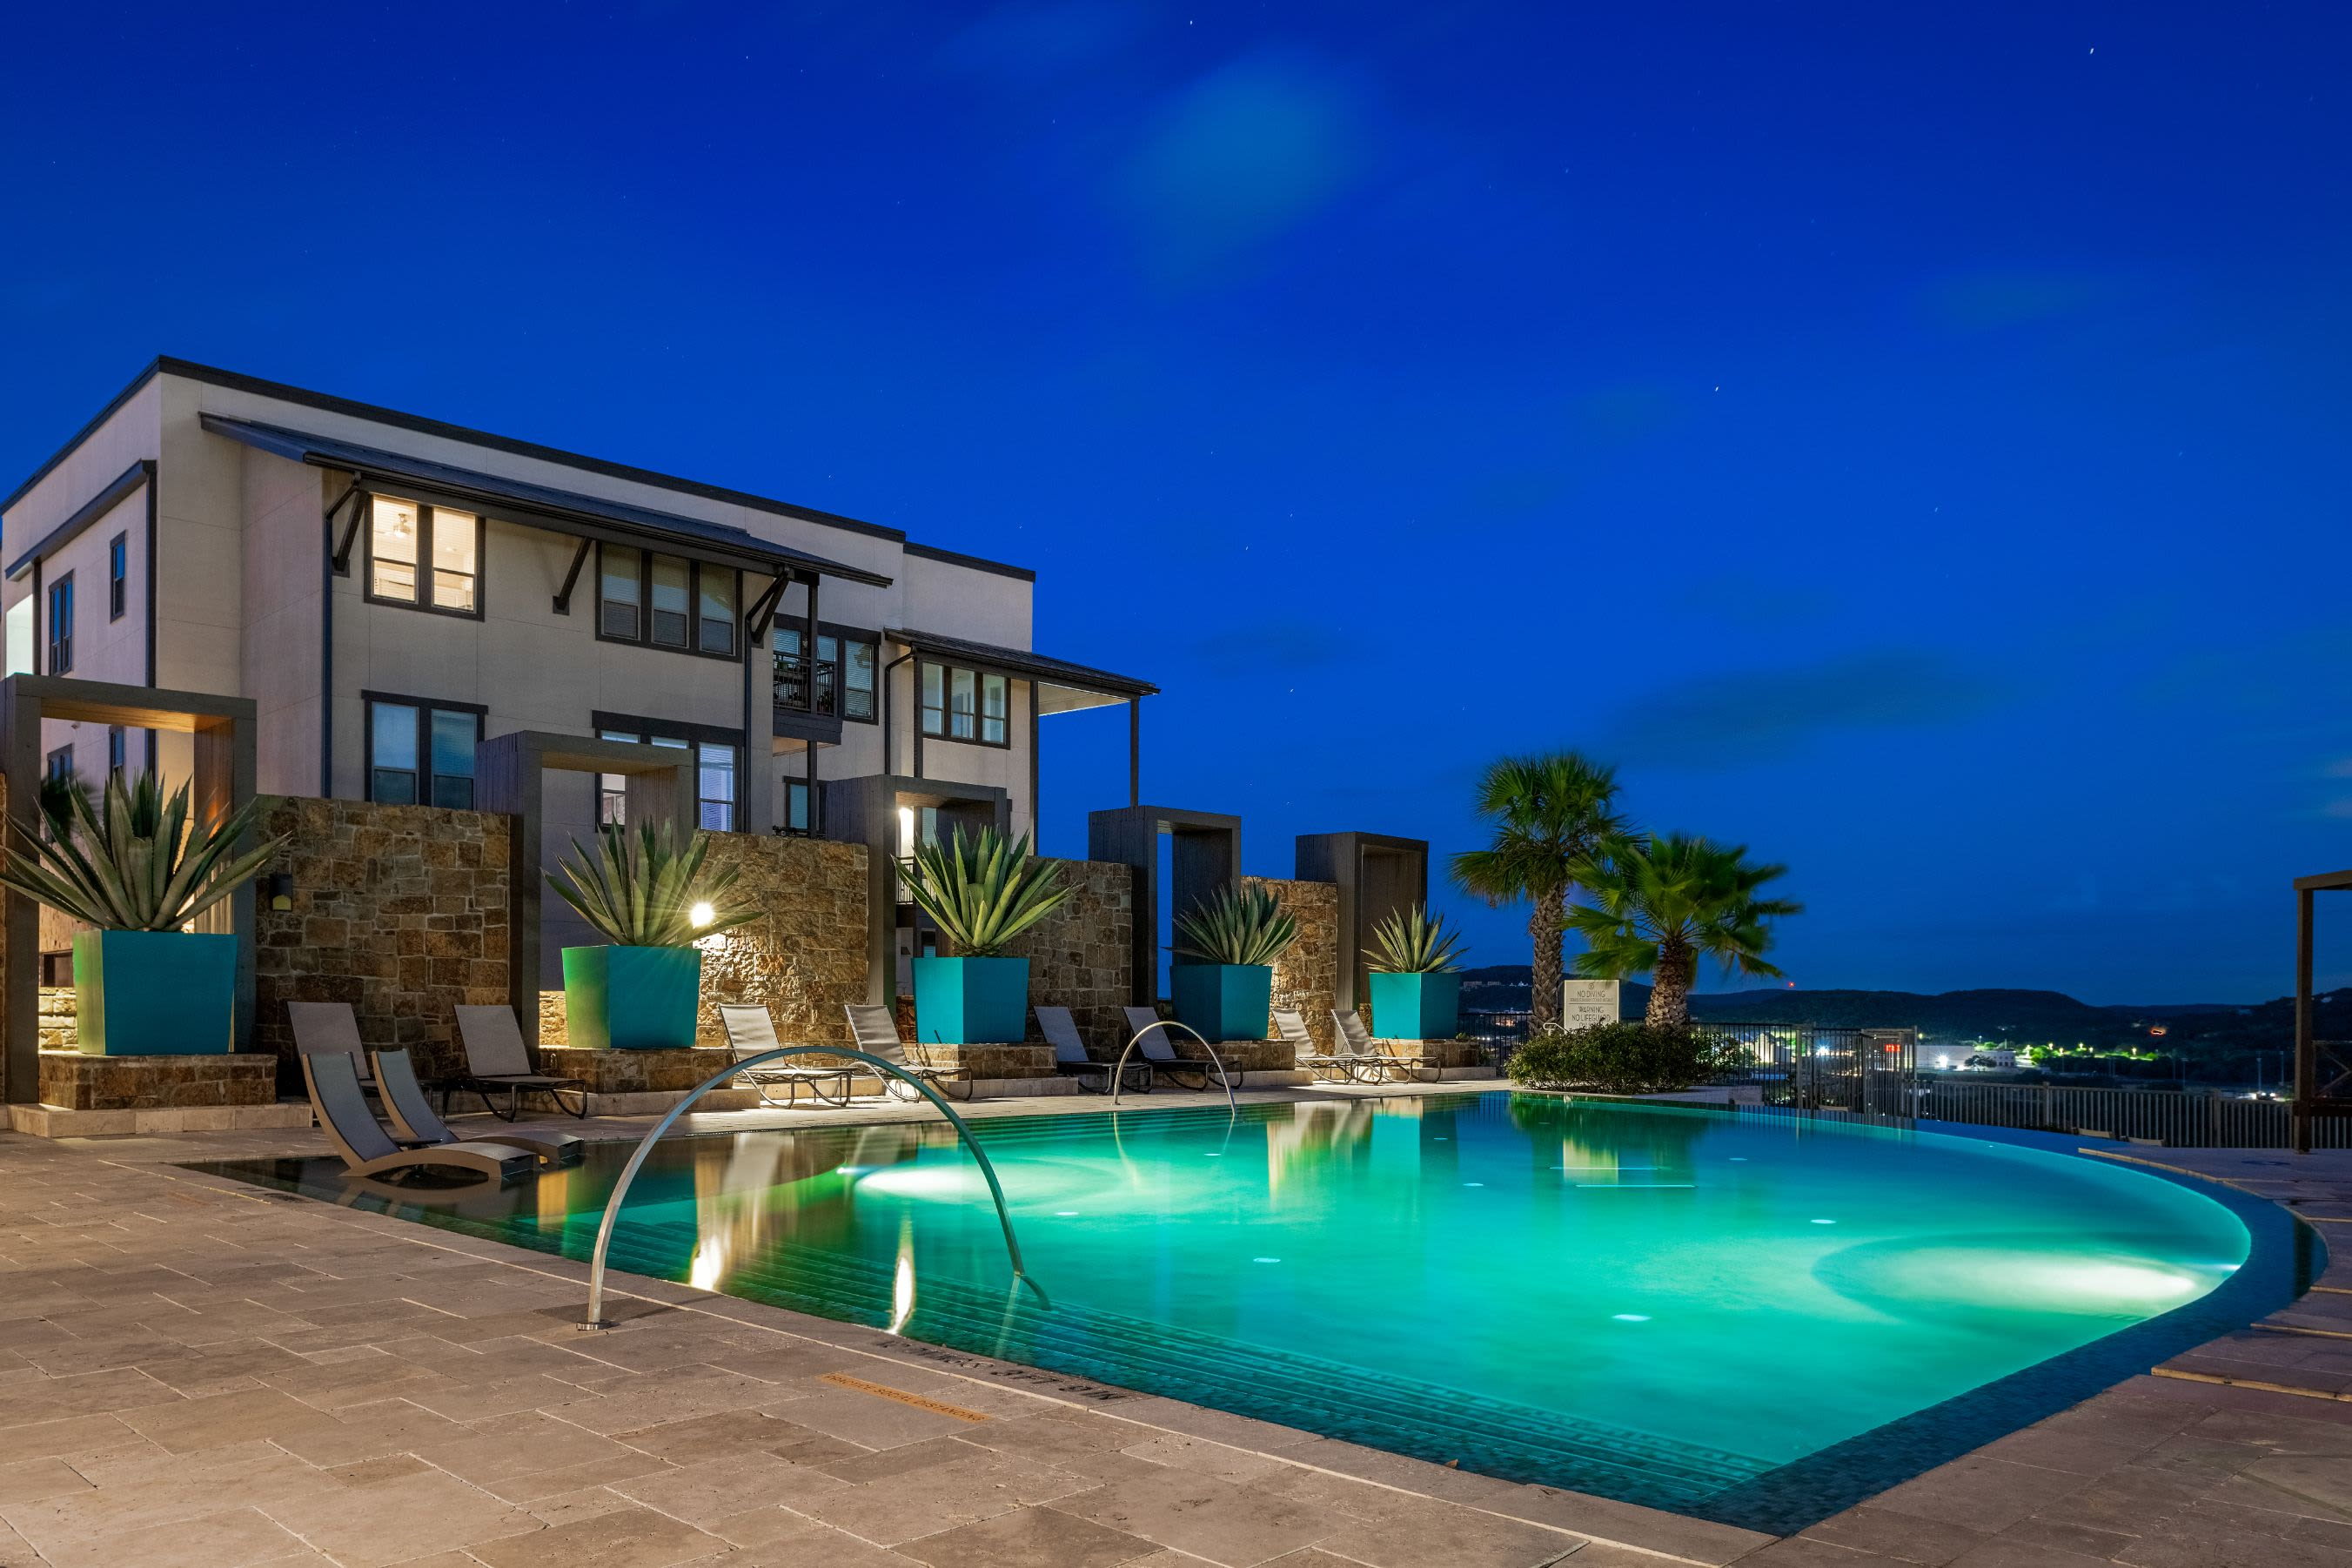 Swimming pool at night at Marquis Cresta Bella in San Antonio, Texas